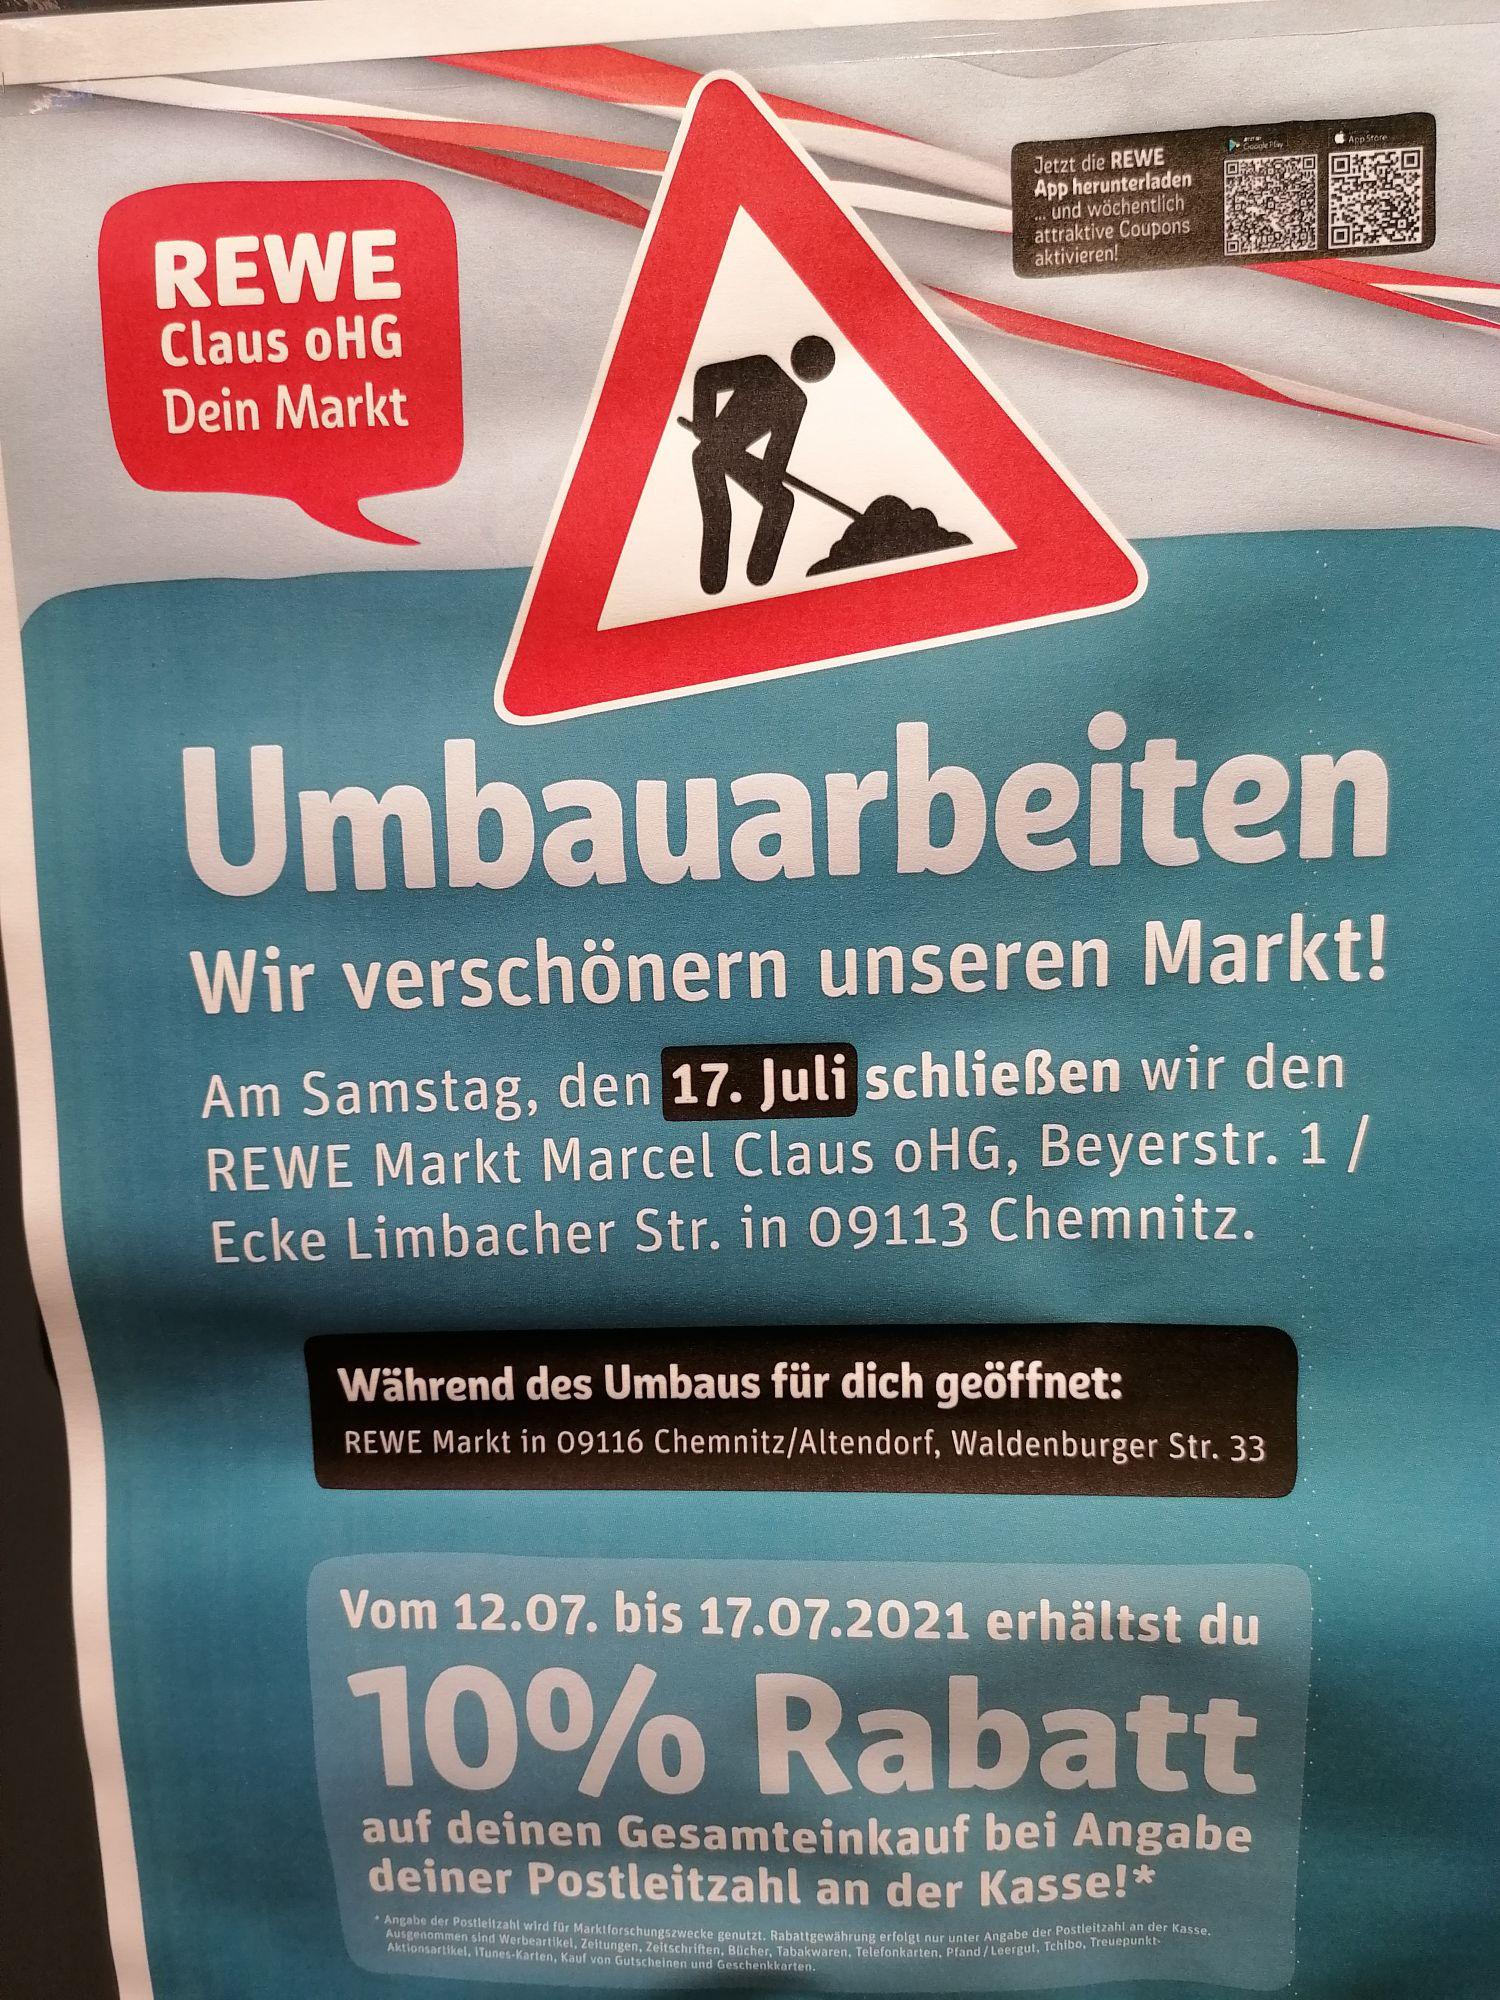 10% Rabatt wegen Renovierung (Lokal Rewe Chemnitz)